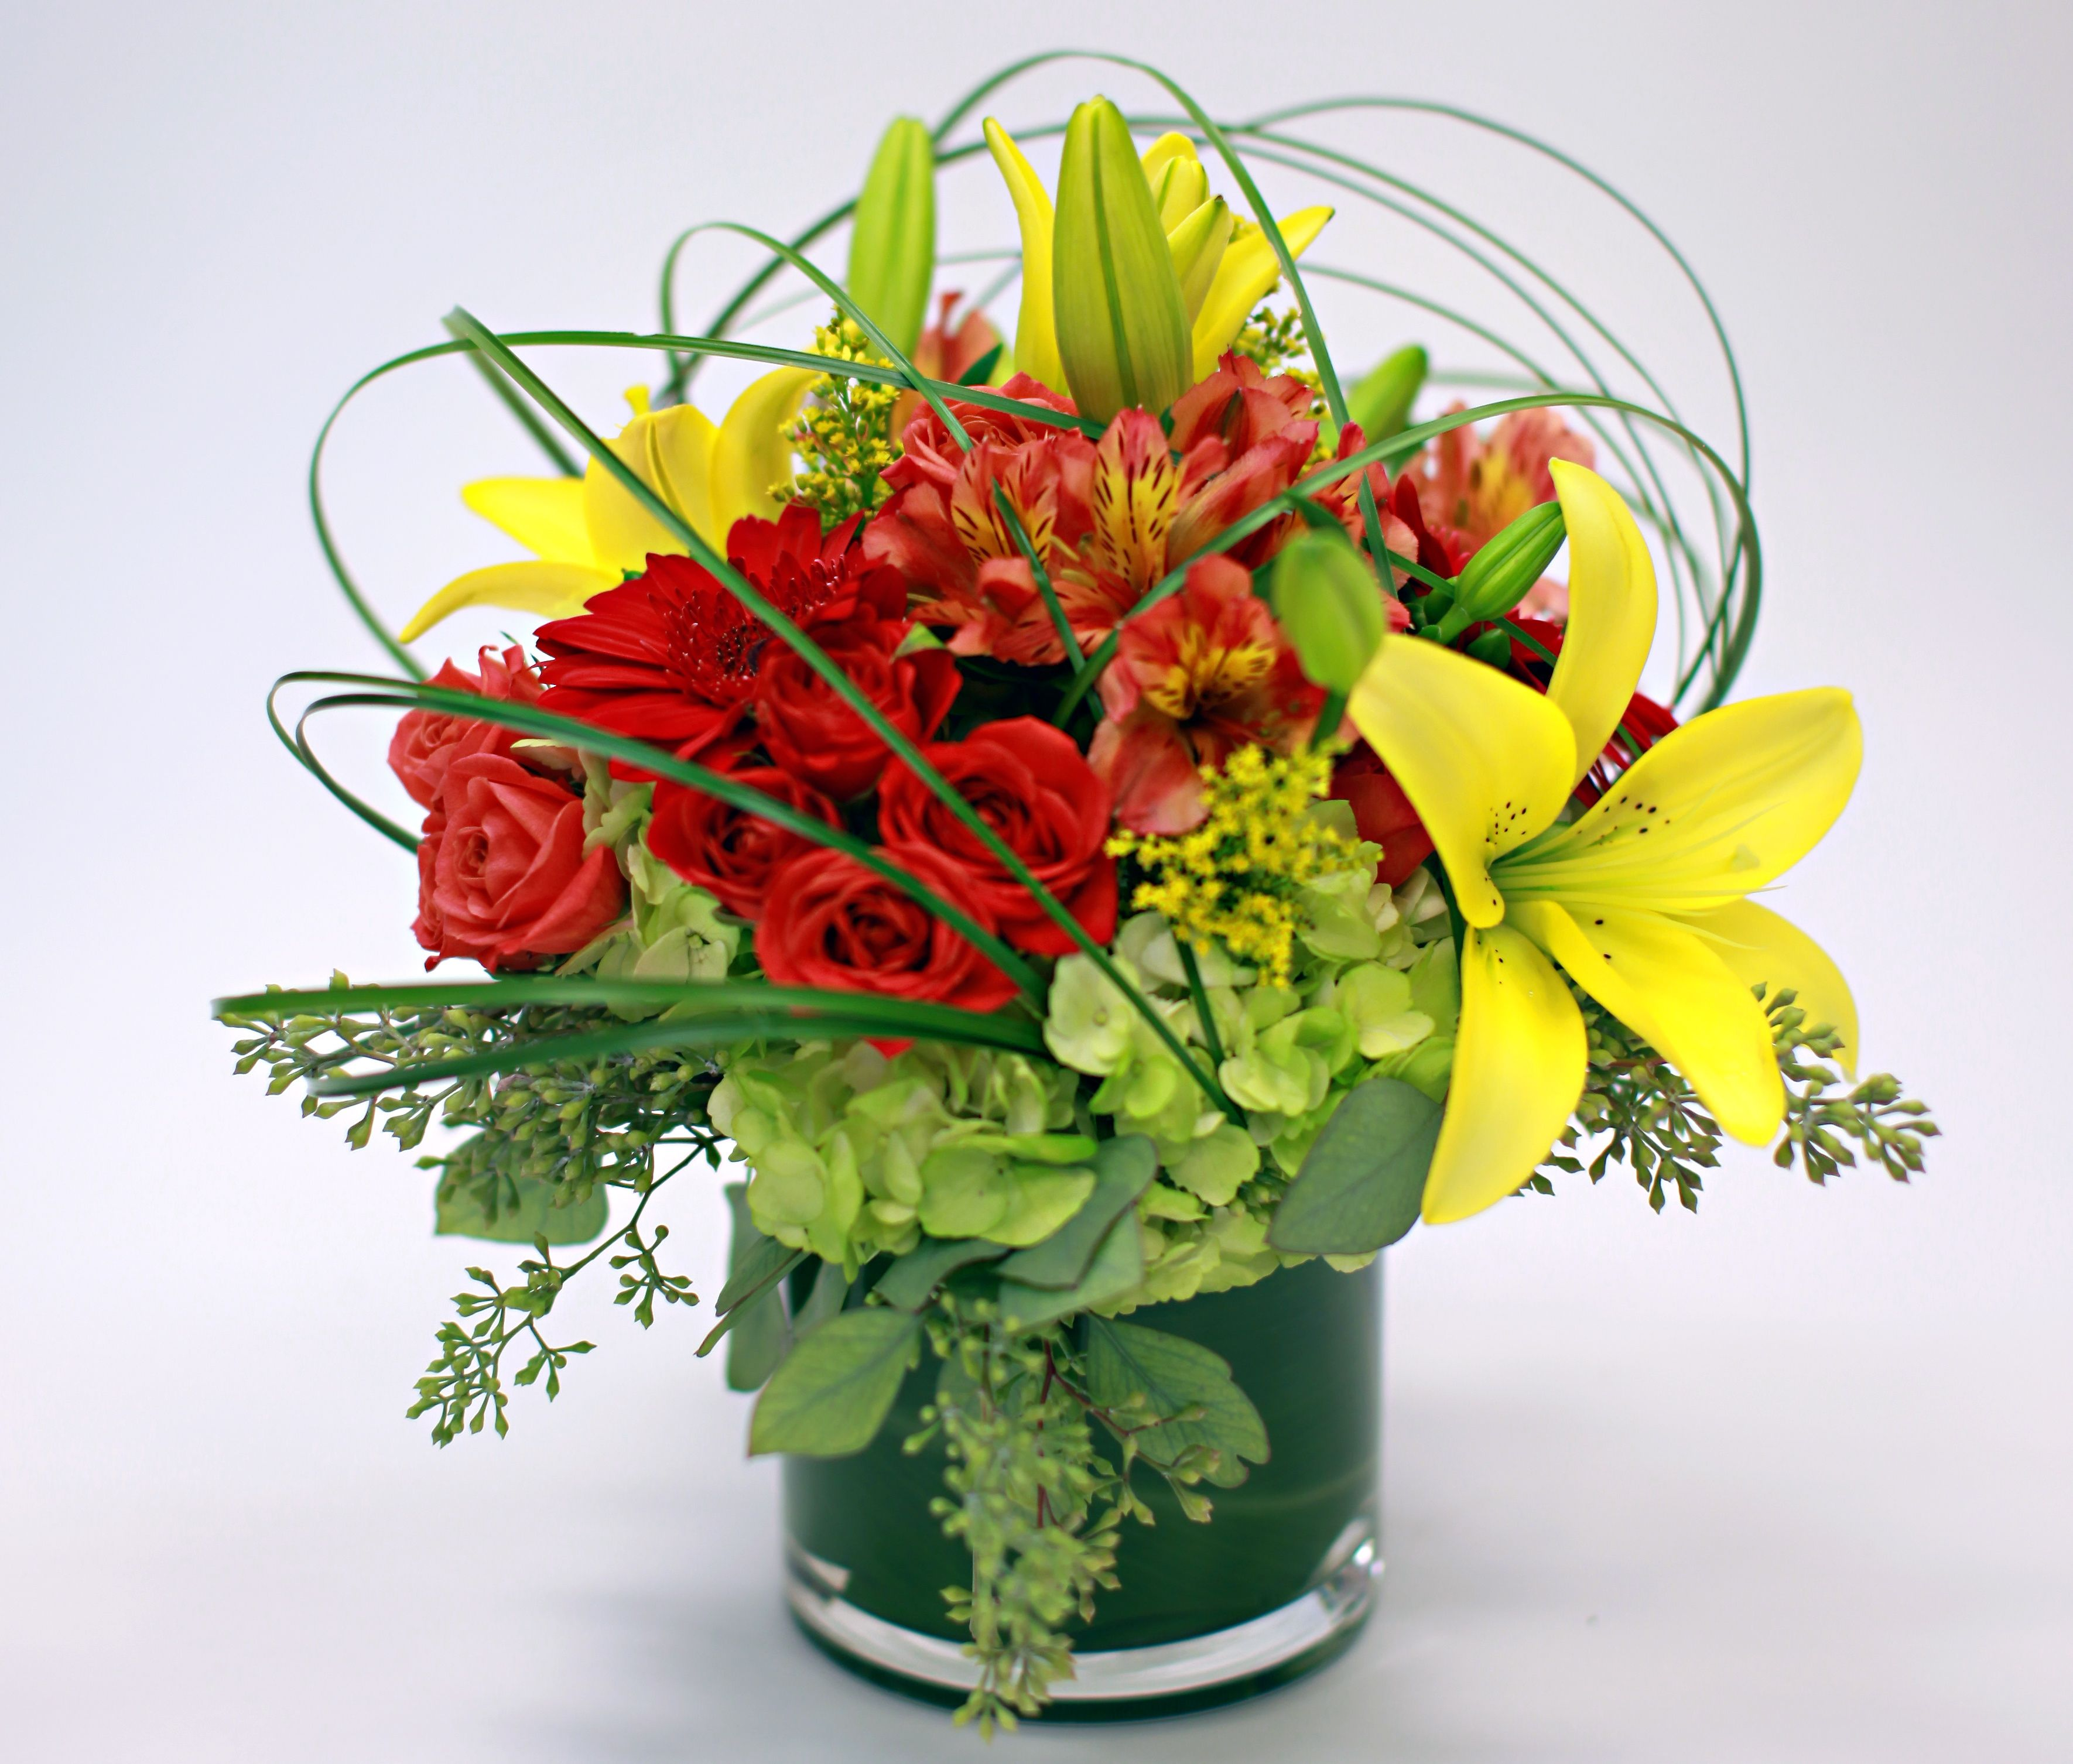 floral arrangement lilies roses bear grass caged